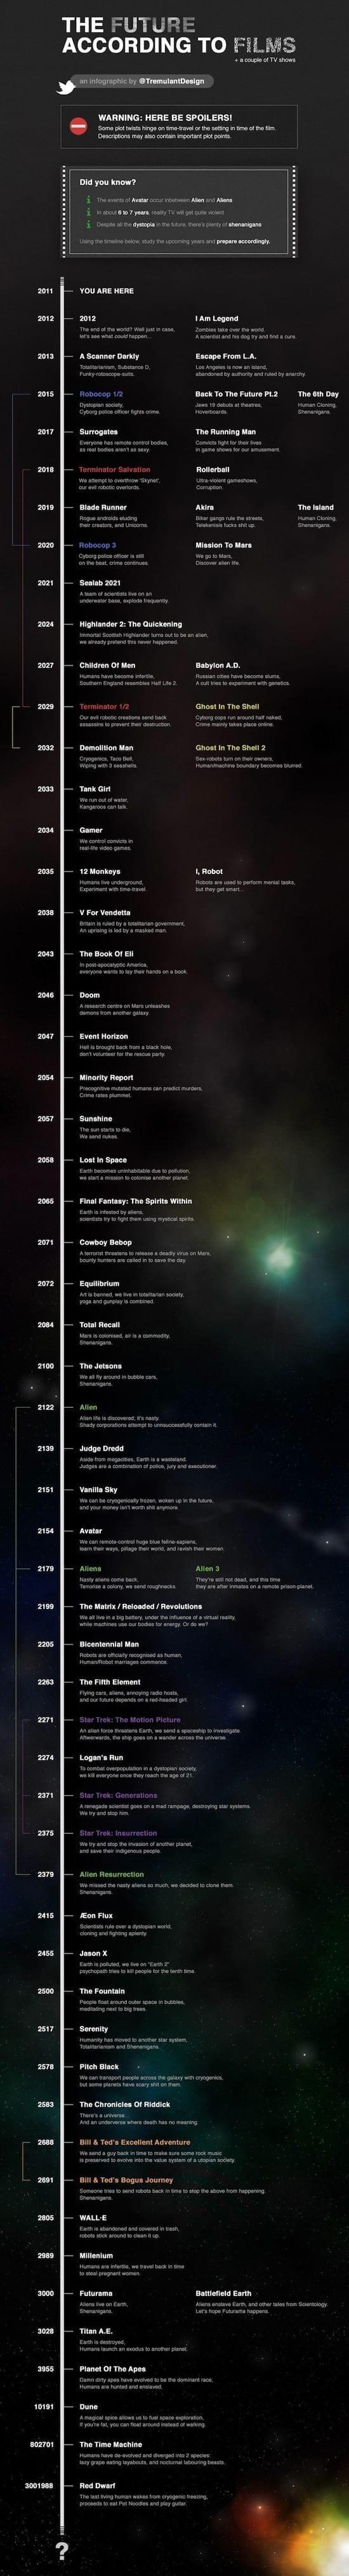 Viitorul Omenirii vazut prin prisma scenariilor de film